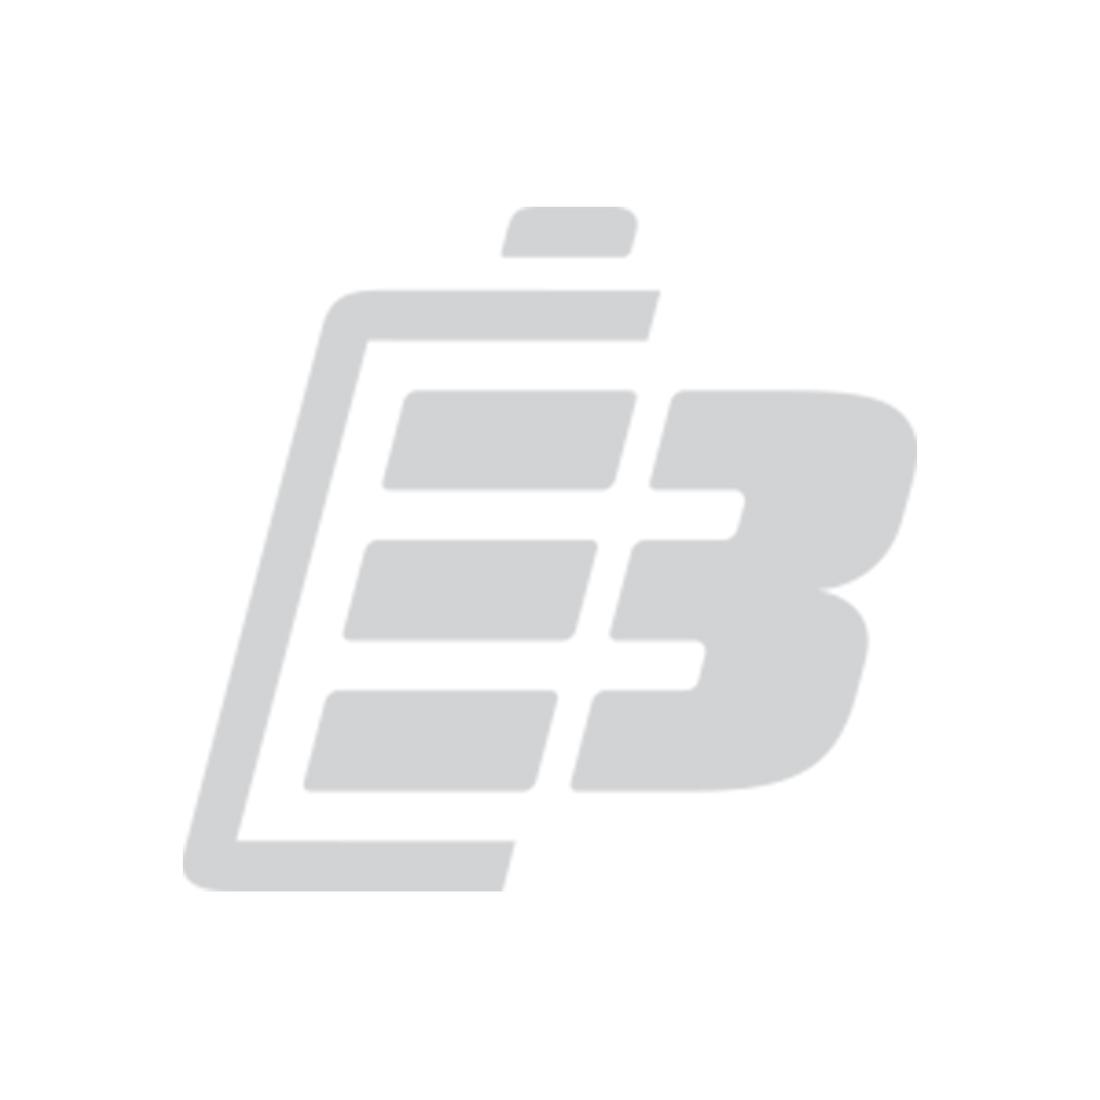 Laptop battery Fujitsu Siemens Amilo Pro V2045_1